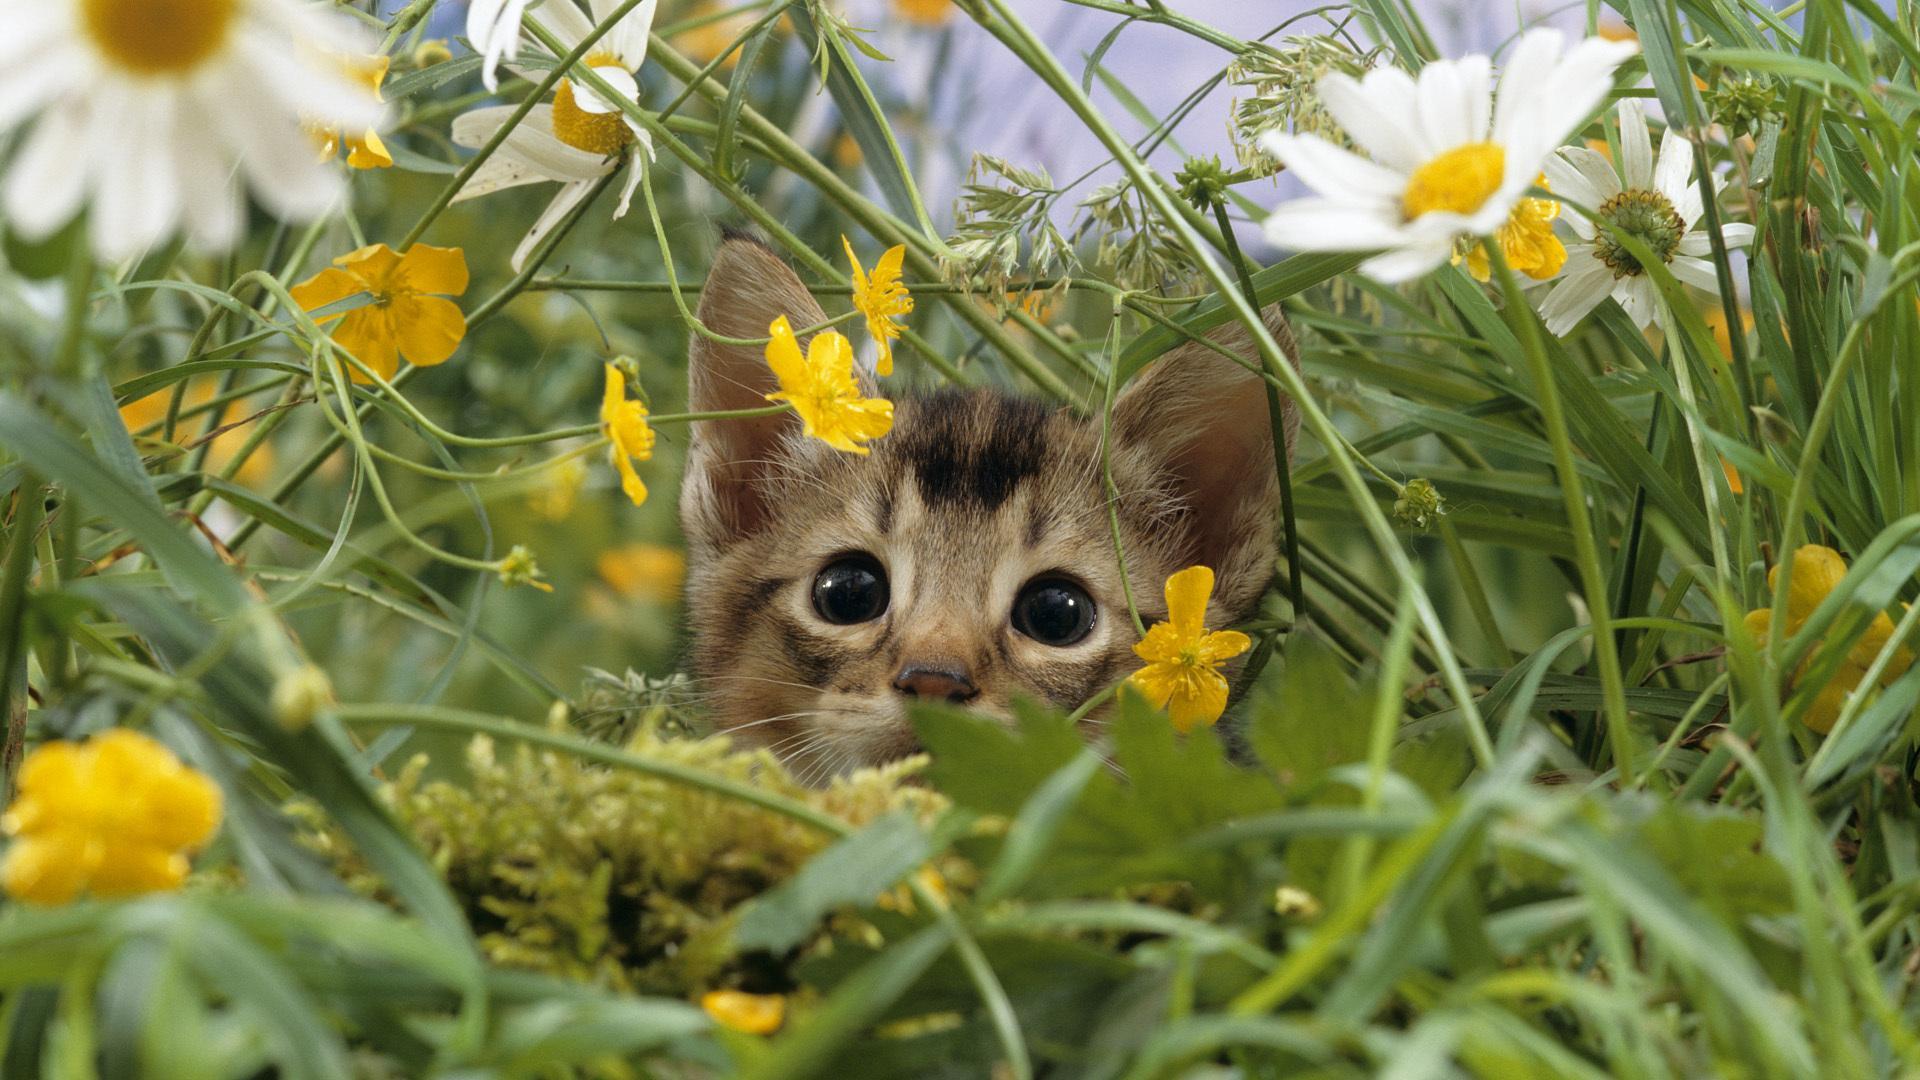 Макро ромашки поляна луг кошка 1920x1080